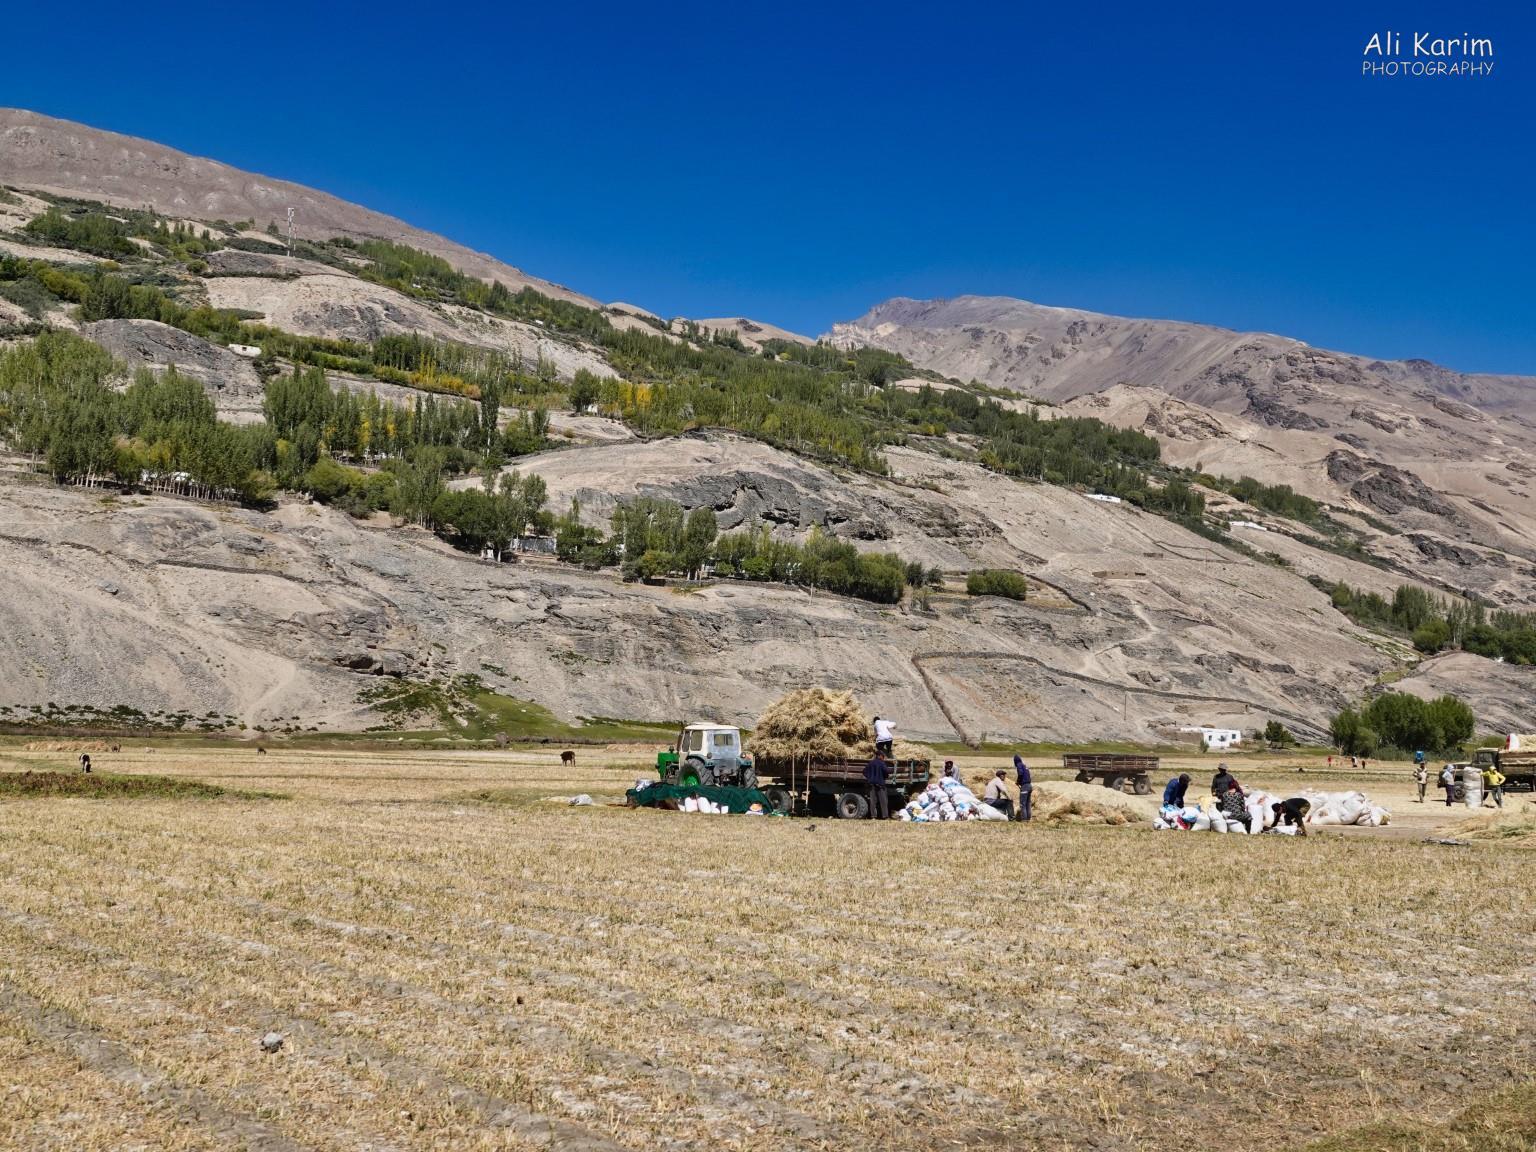 Langar, Bulunkul Tajikistan, More farming scenes